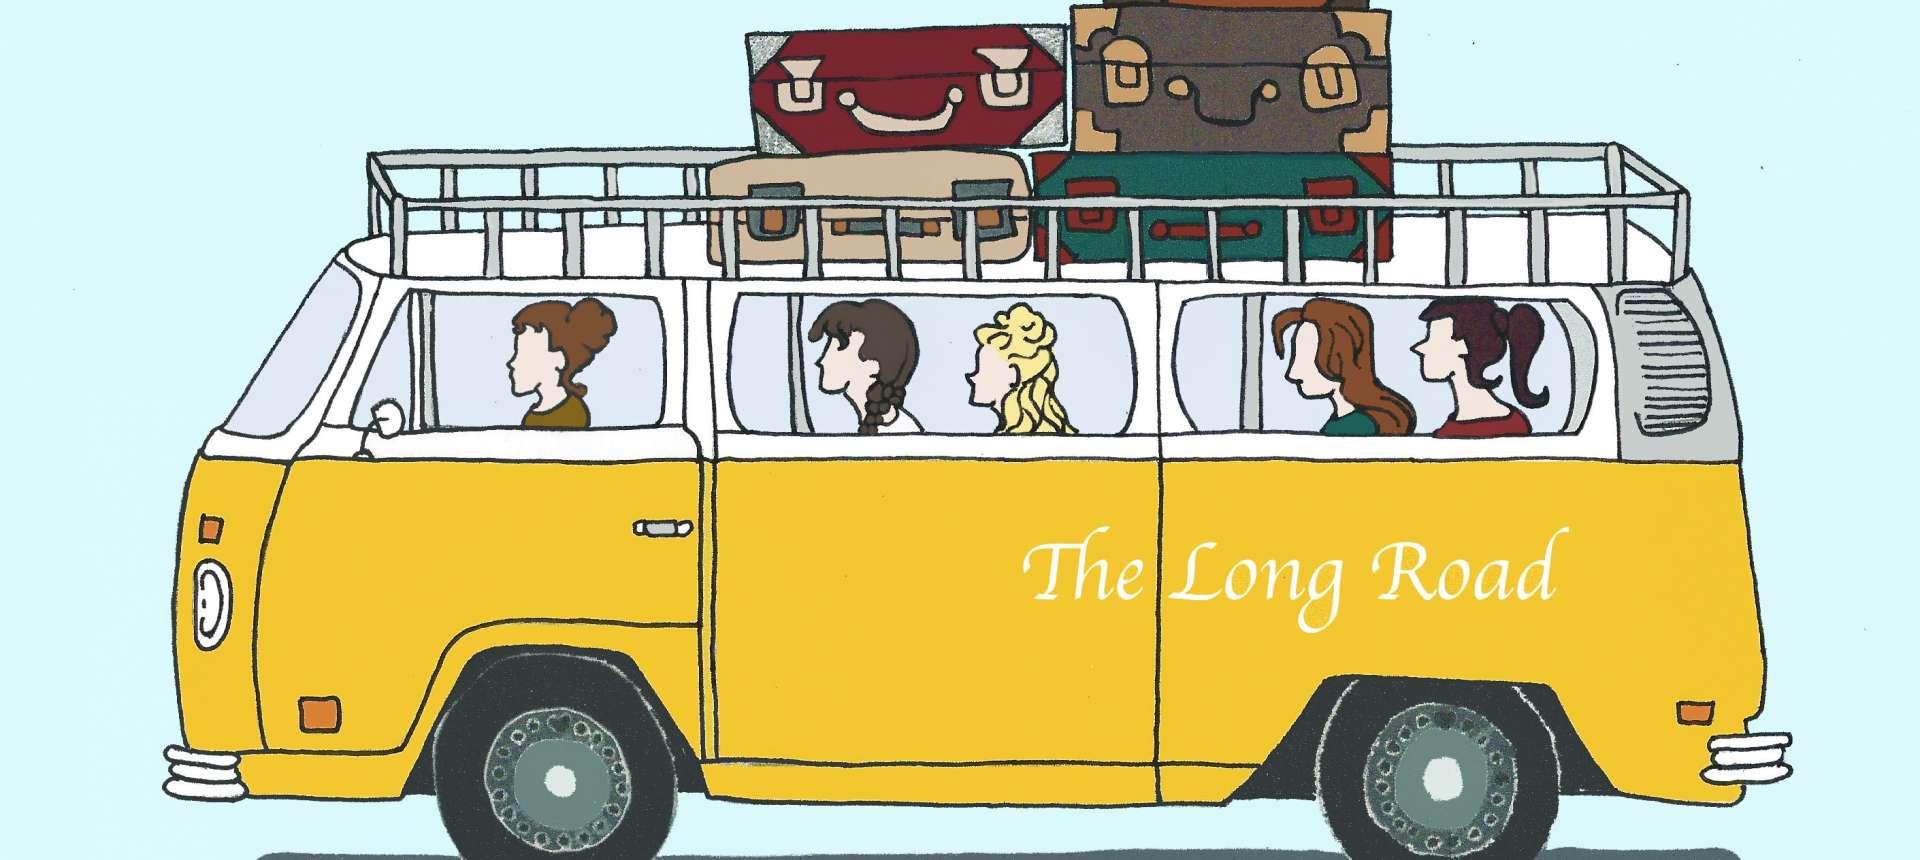 The Long Road : aider un projet social, culturel et artistique